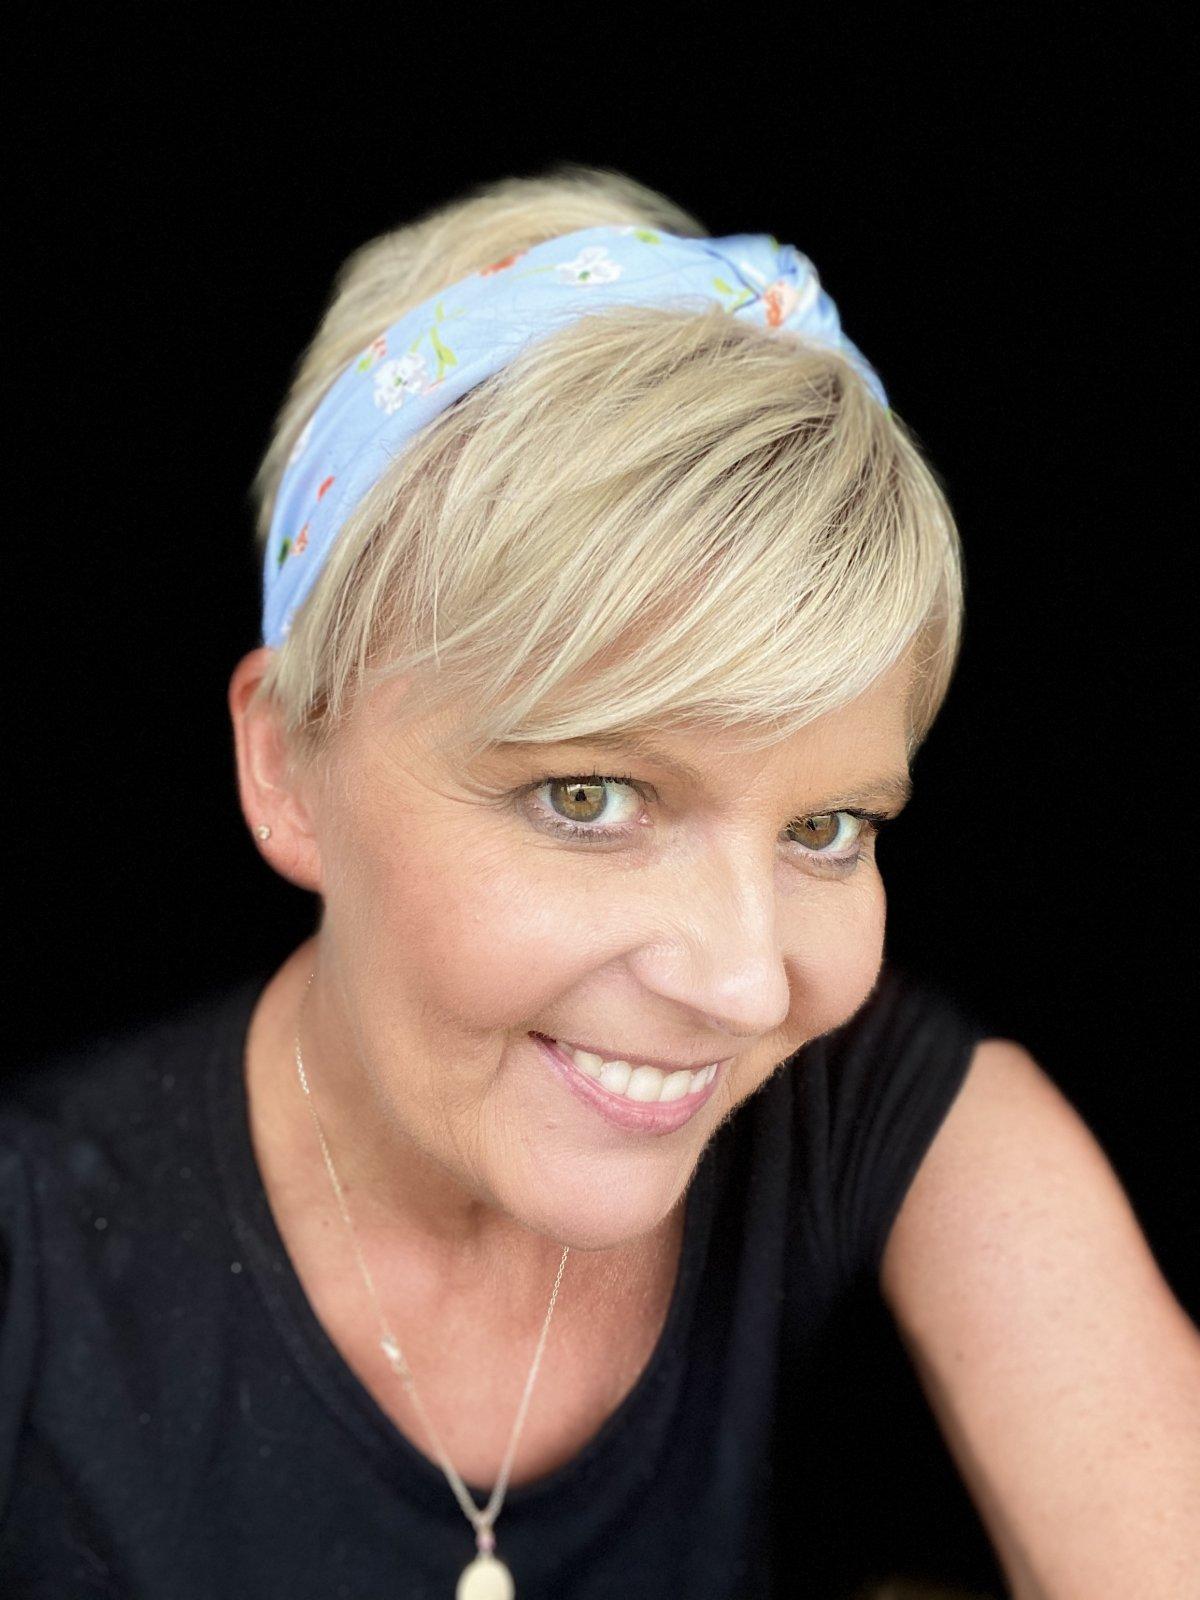 baby blue floral headband